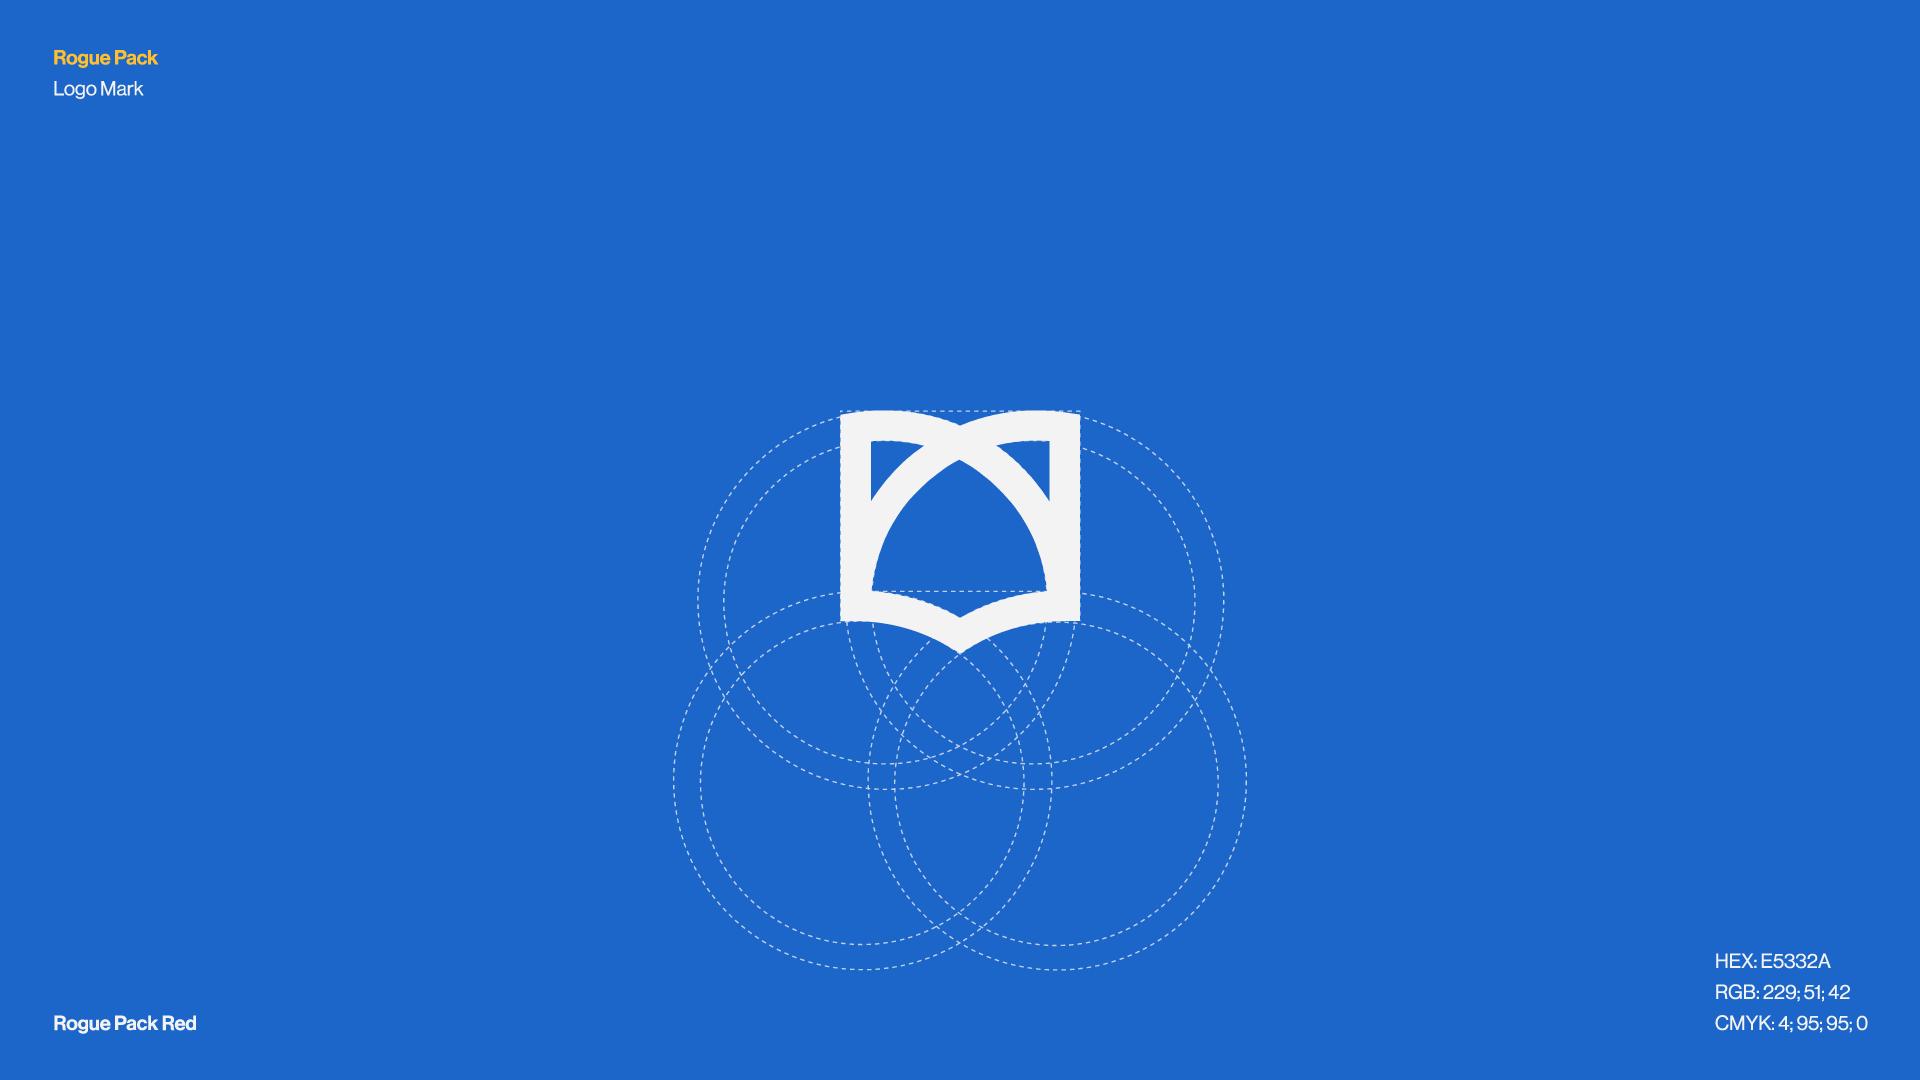 Rogue Pack logo grid. Modern Logo Design